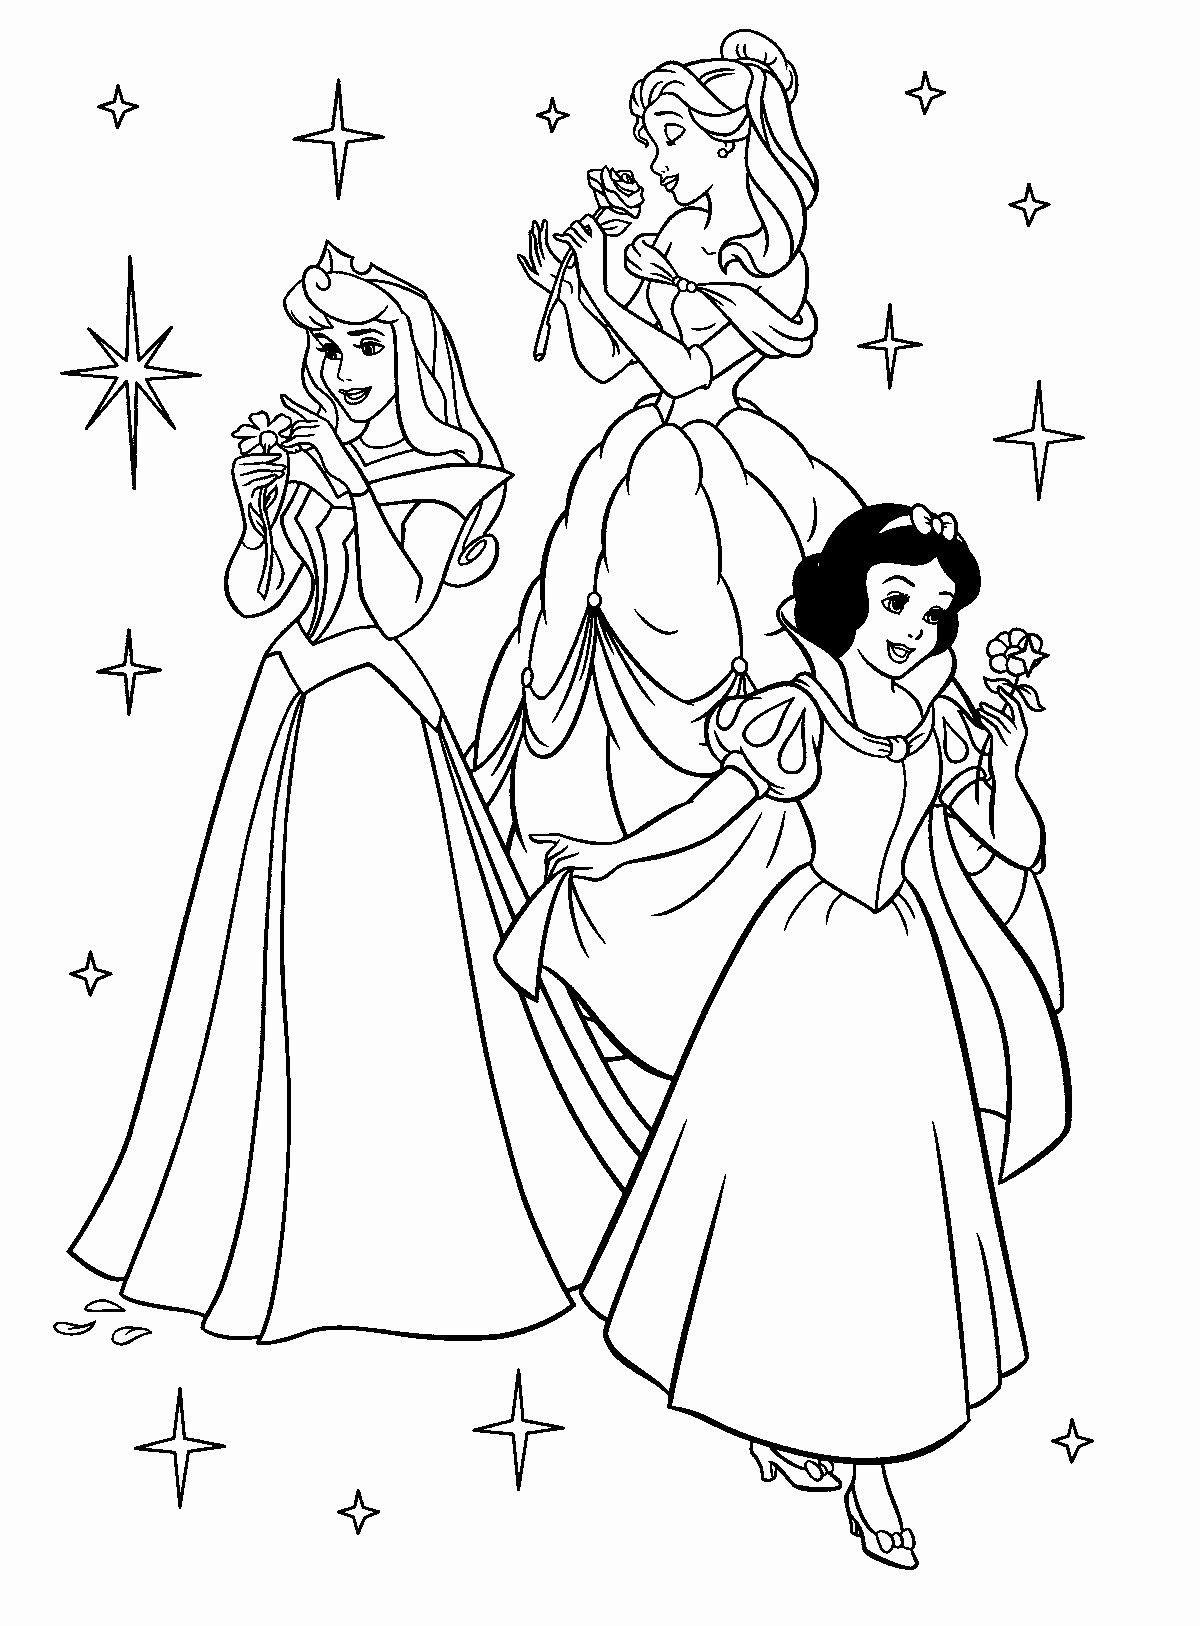 Colouring Games Of Disney Princess